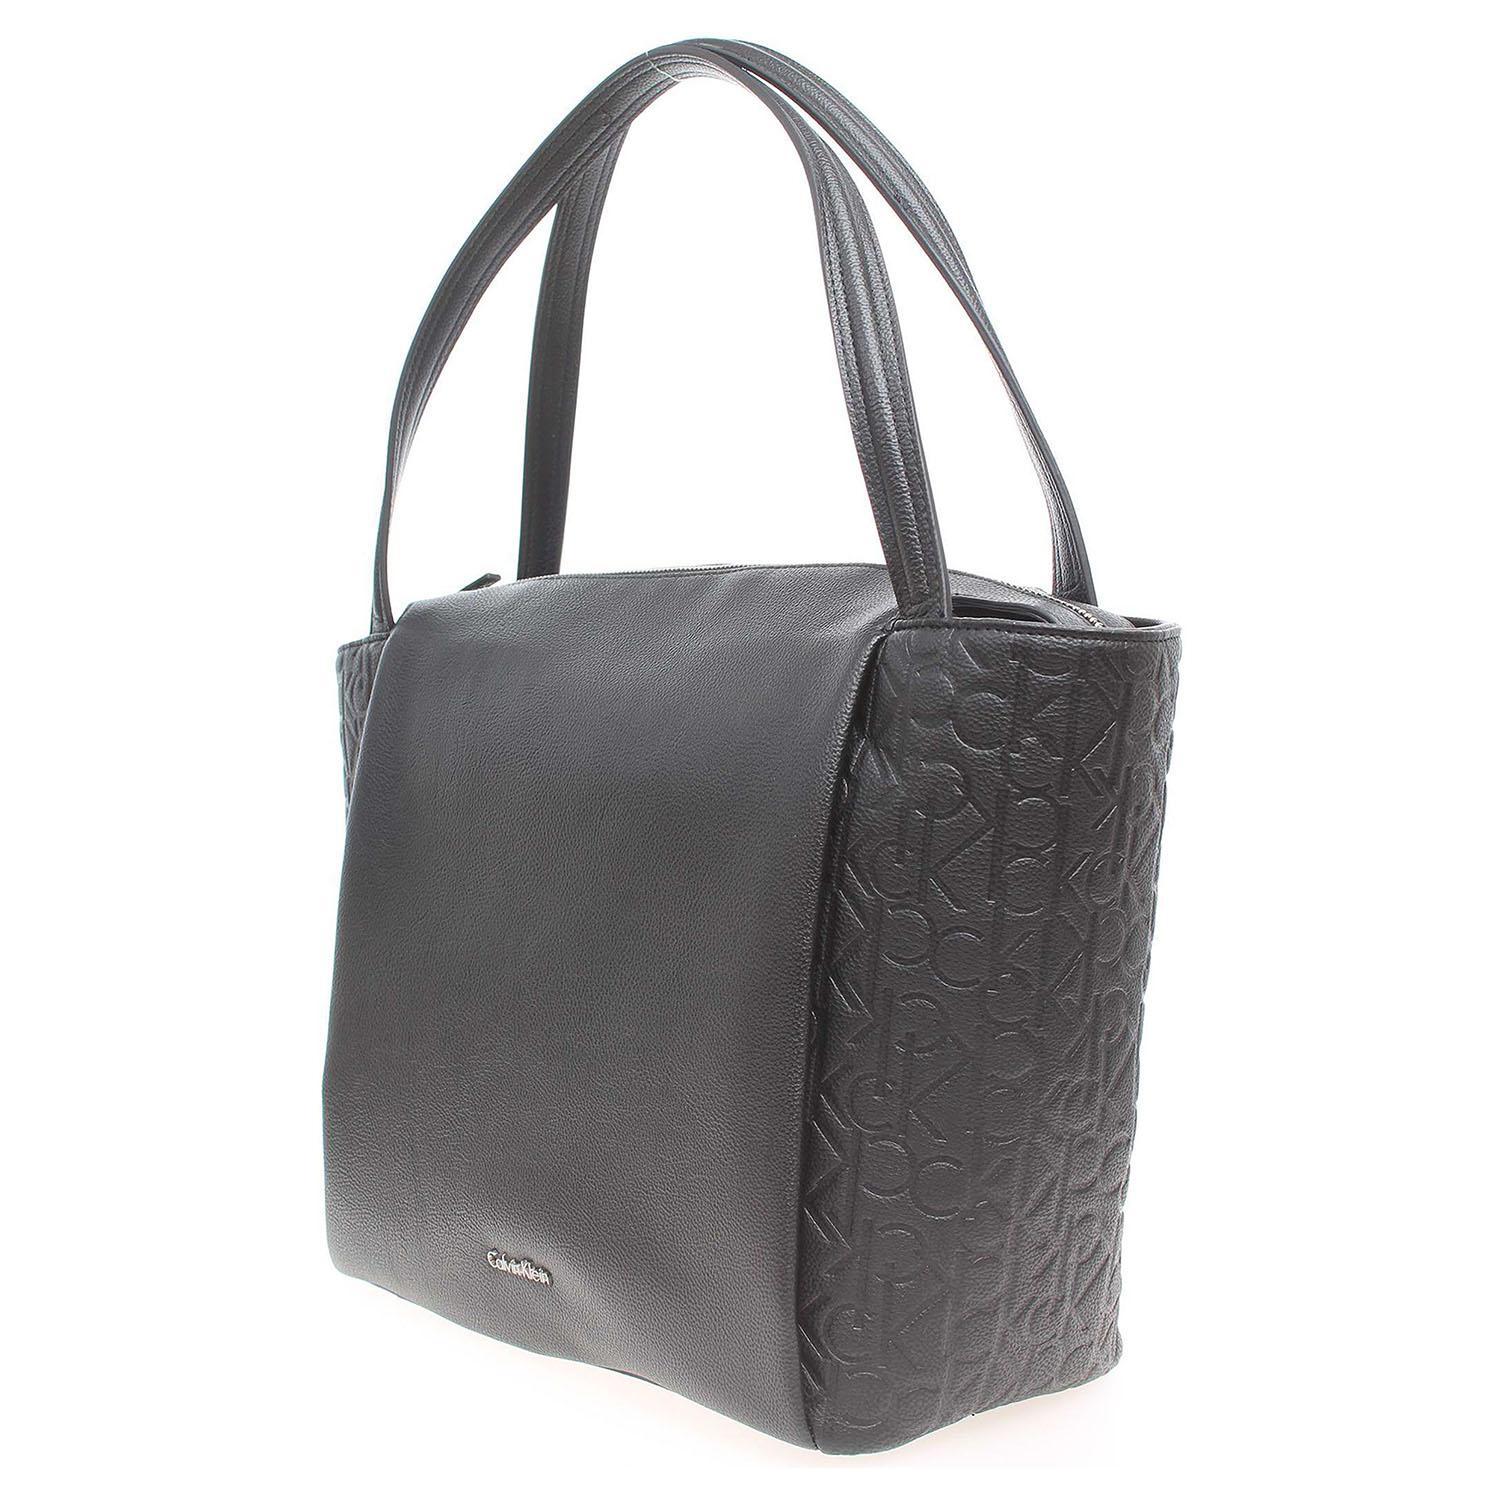 Ecco Calvin Klein dámská kabelka K60K602120001 černá 11891138